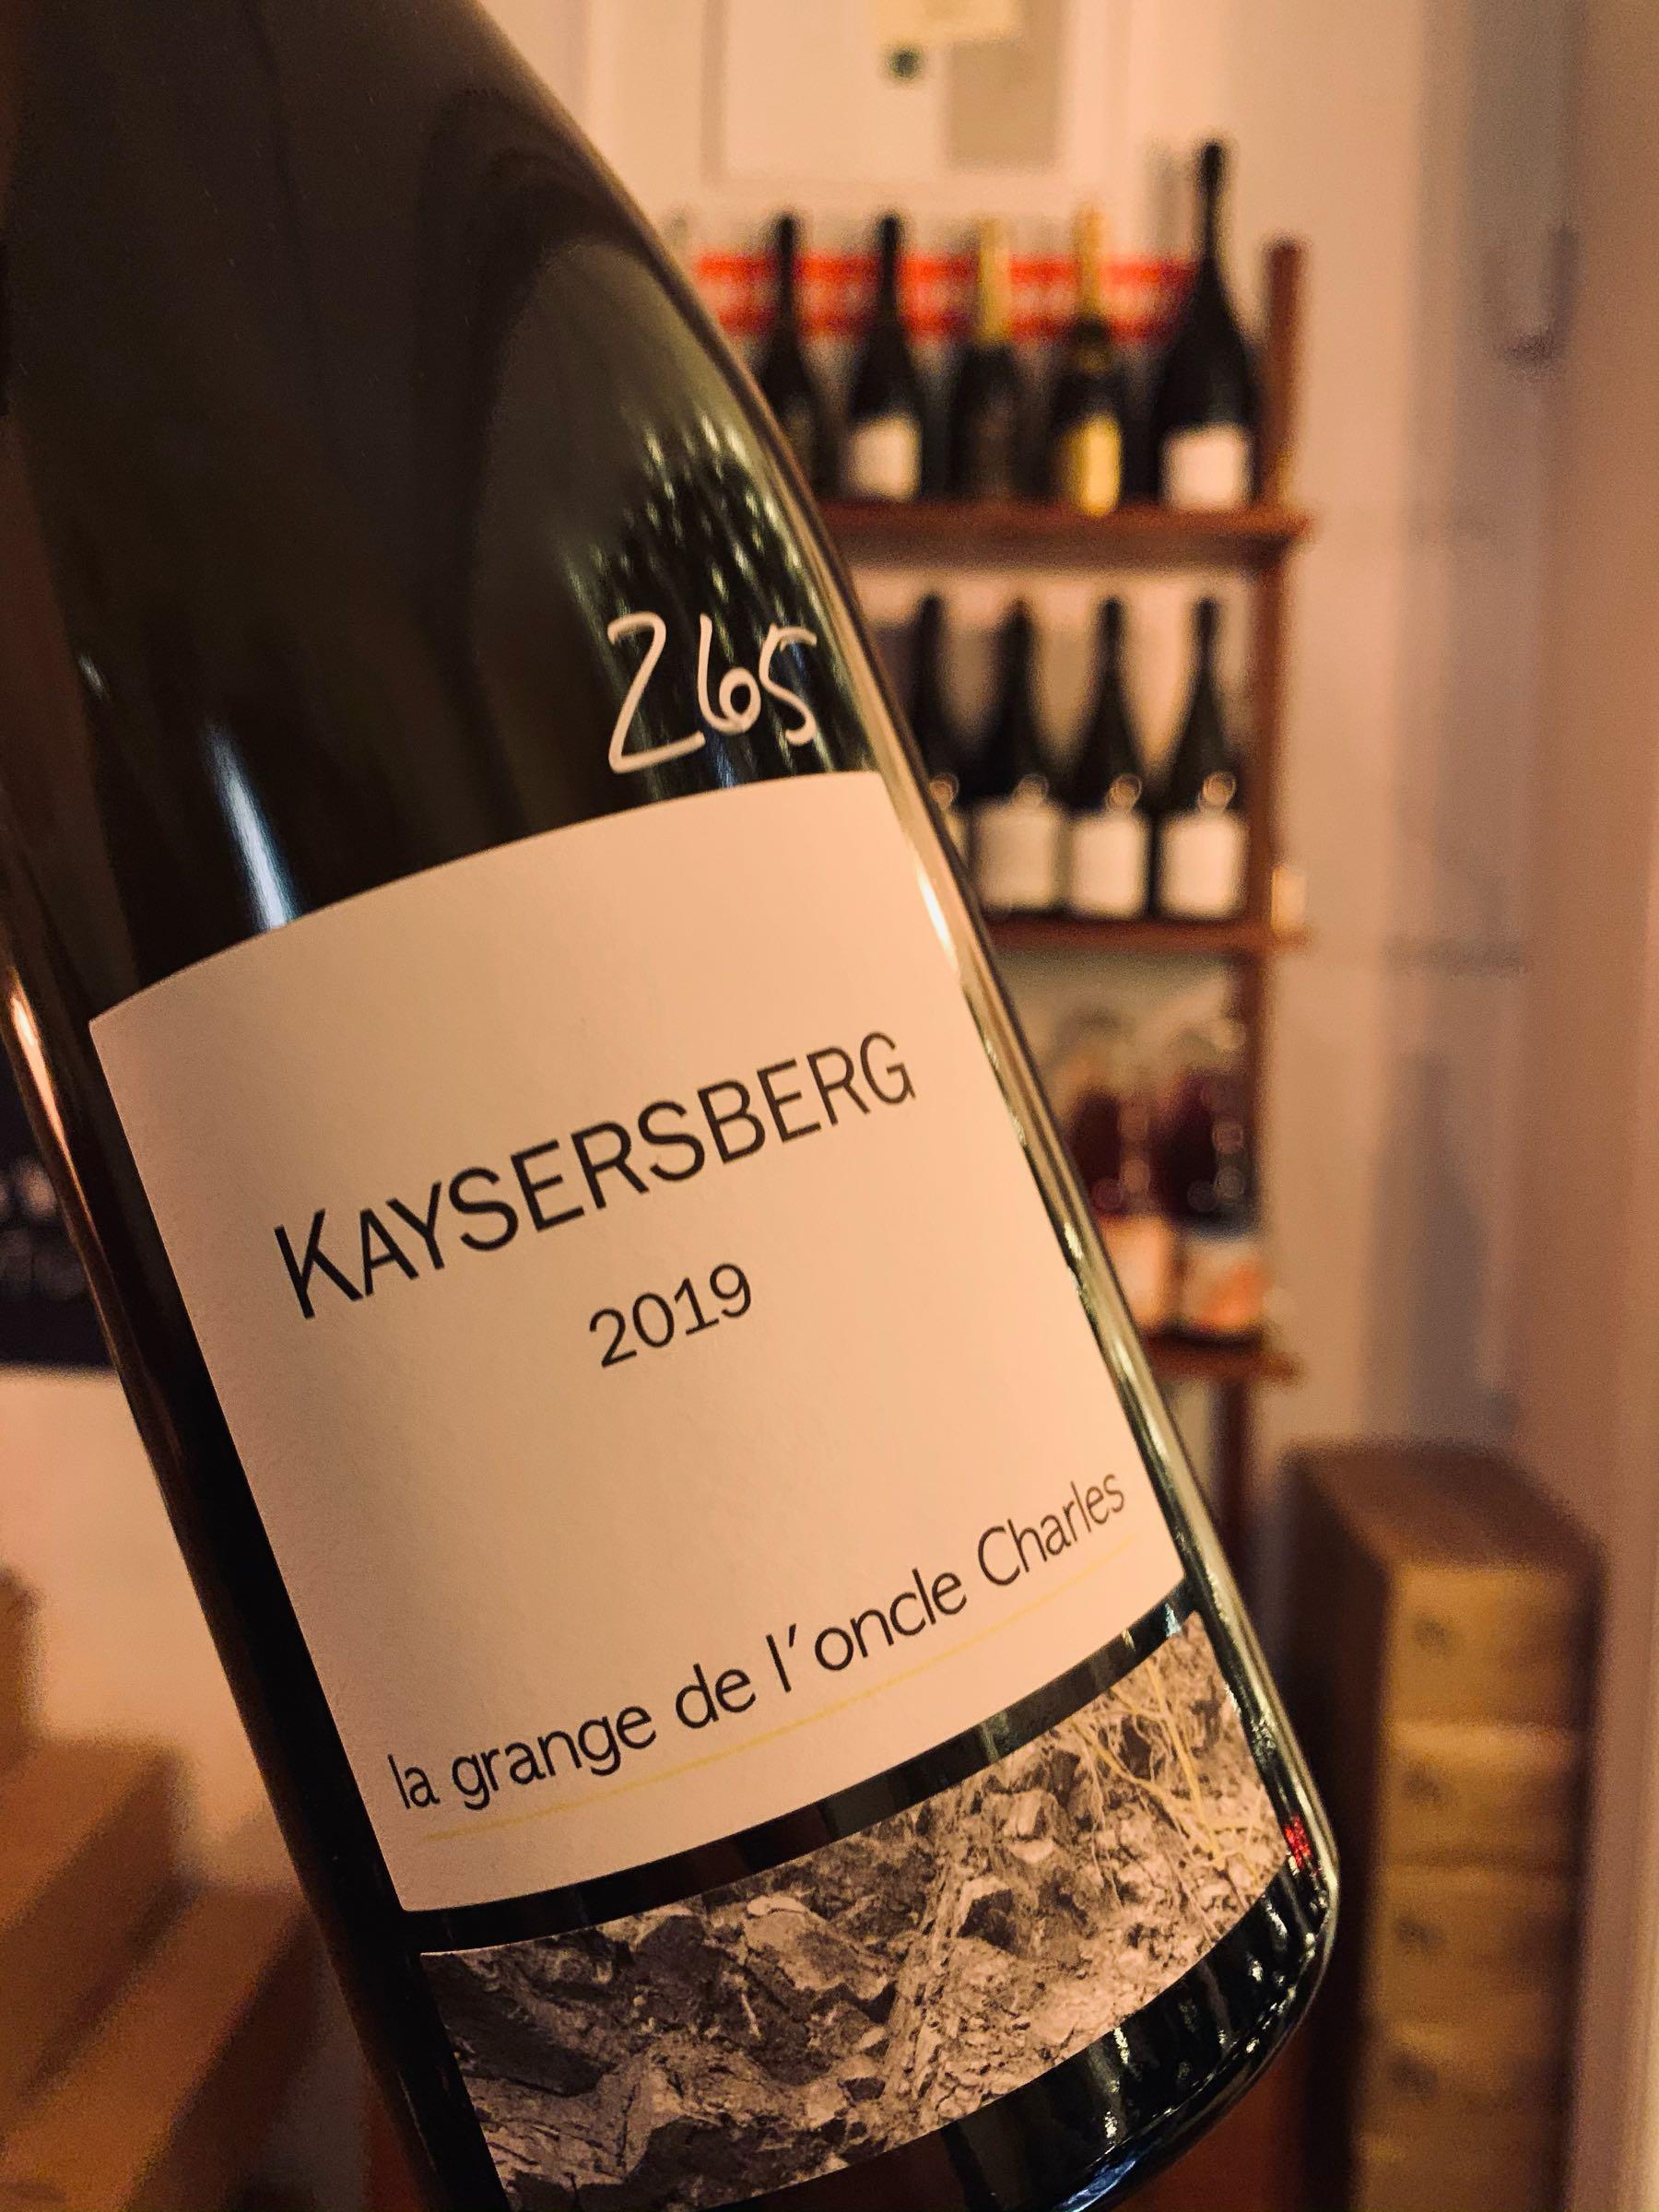 Kaysersberg 2019 - Jerome Francois